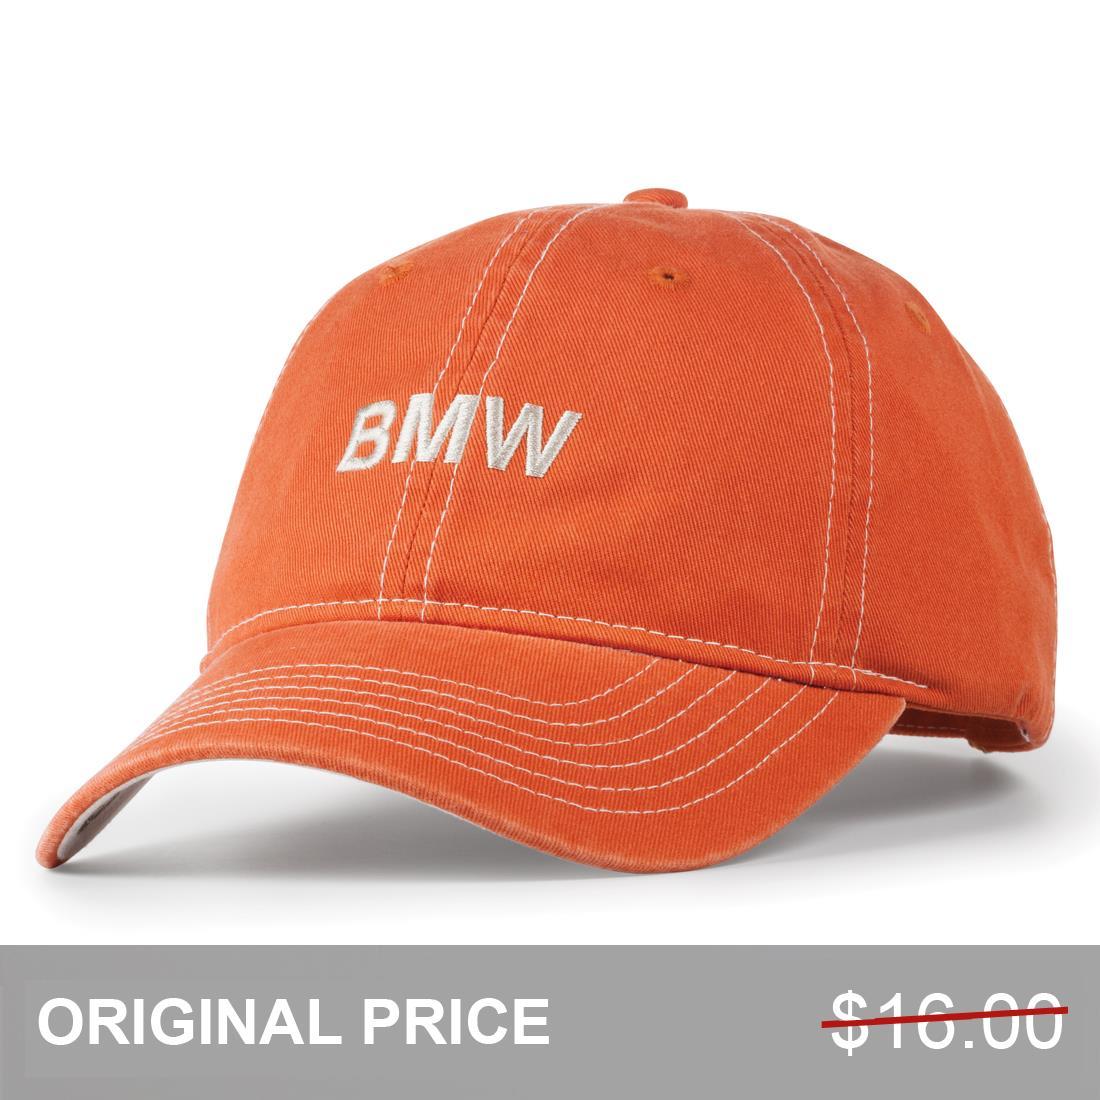 ShopBMWUSA.com: BMW CONTRAST STITCH CAP Stitch Cap